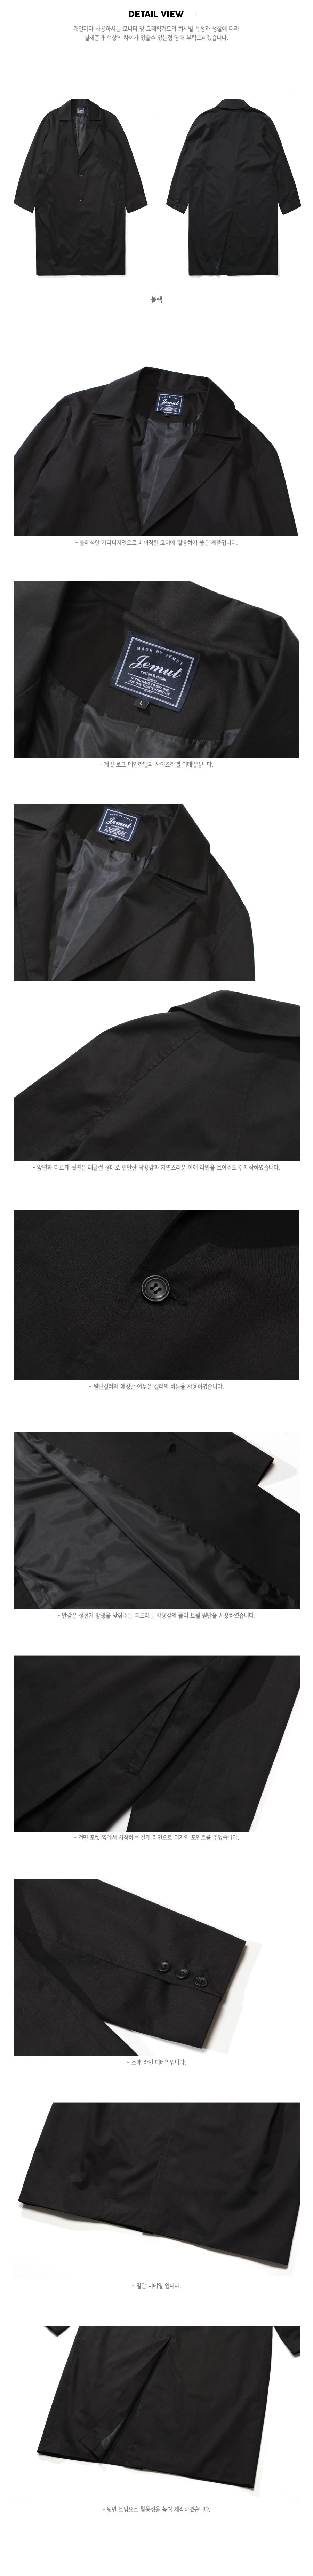 20181029_classic_line_coat_black_kj.jpg